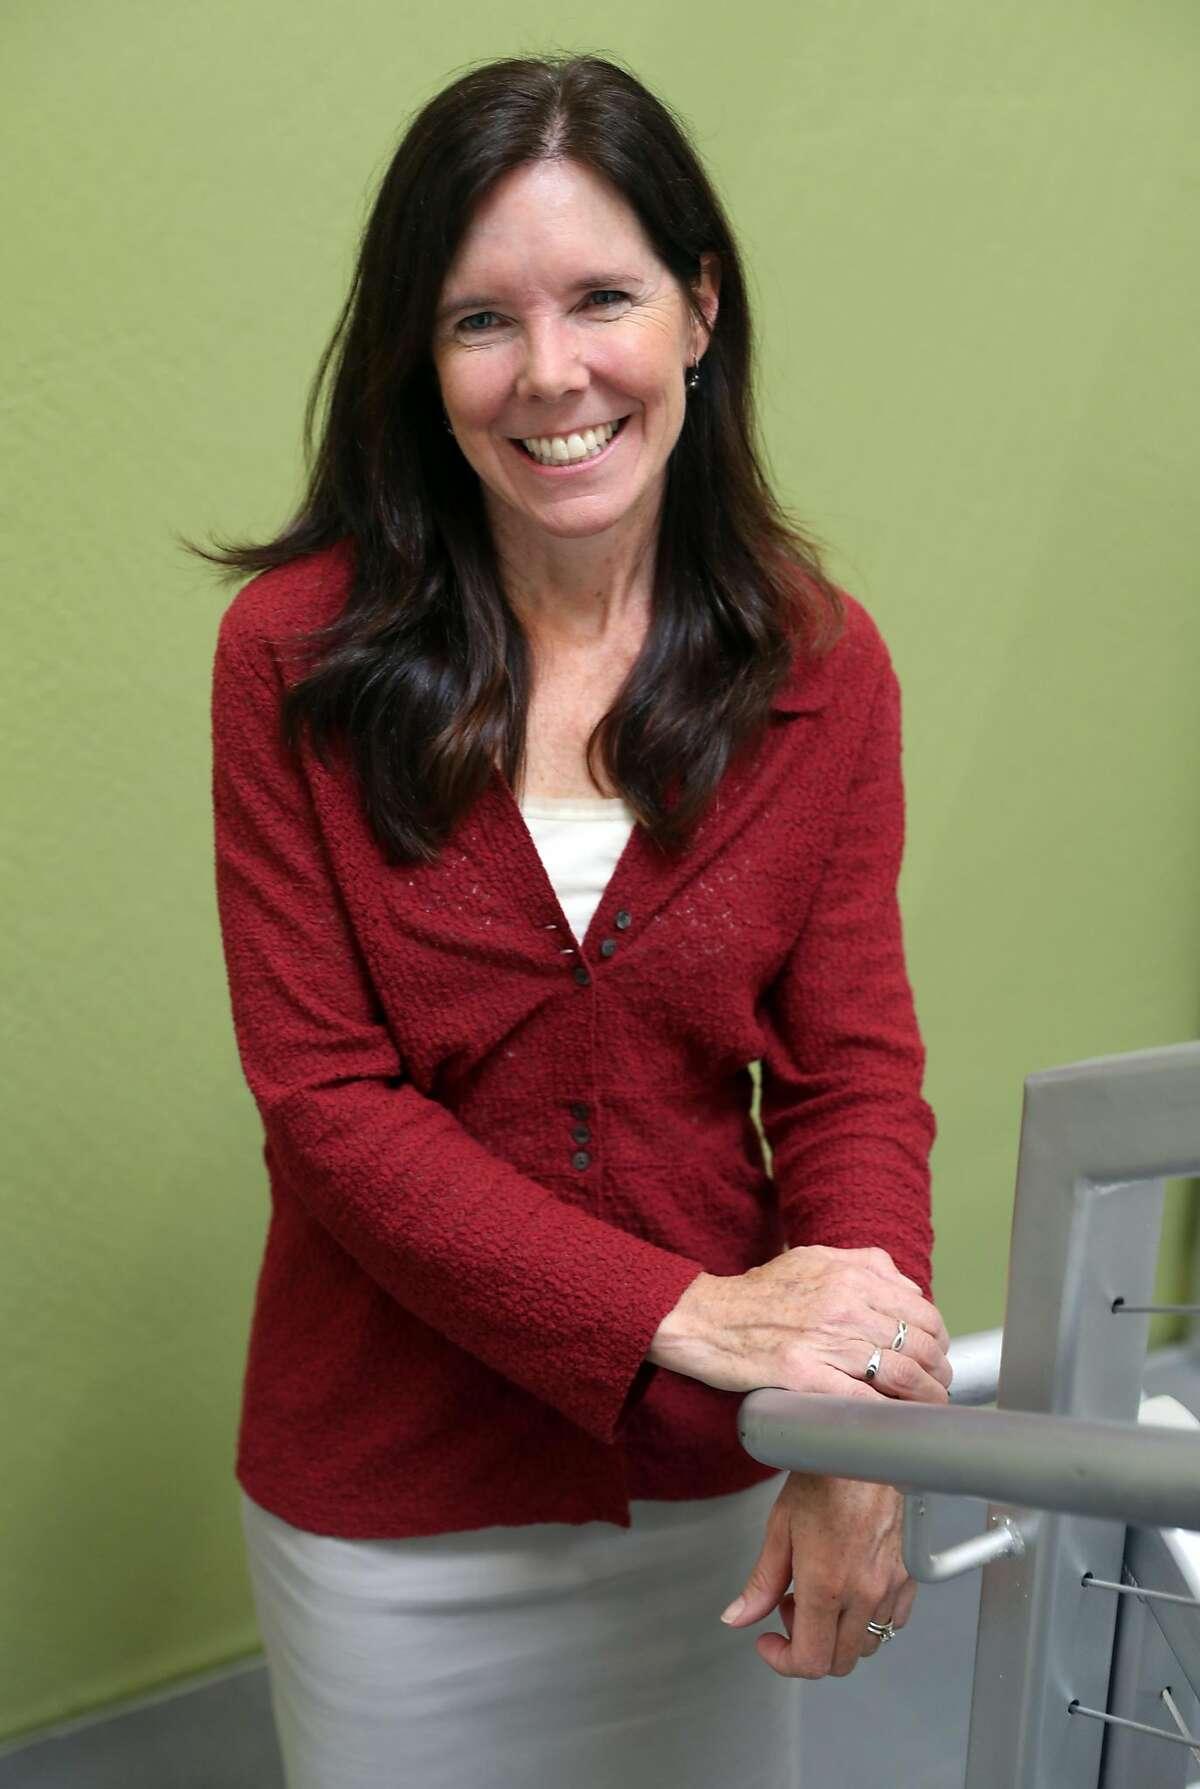 Marin Clean Energy CEO Dawn Weisz in San Rafael, CA on Wednesday, May 23, 2018.